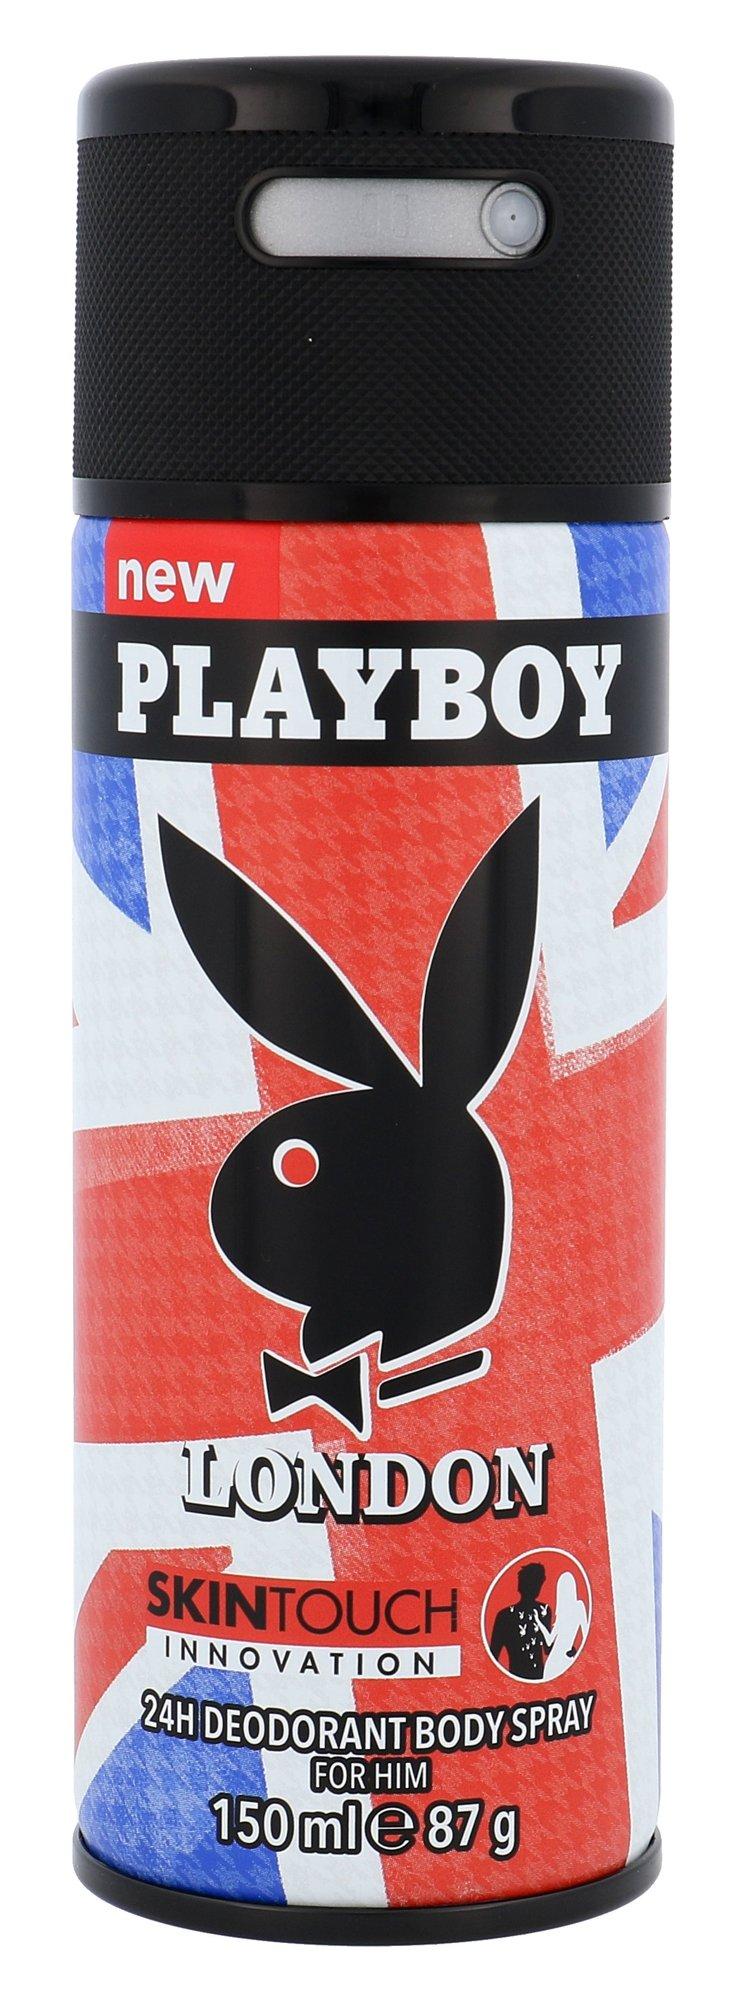 Playboy London Deodorant 150ml